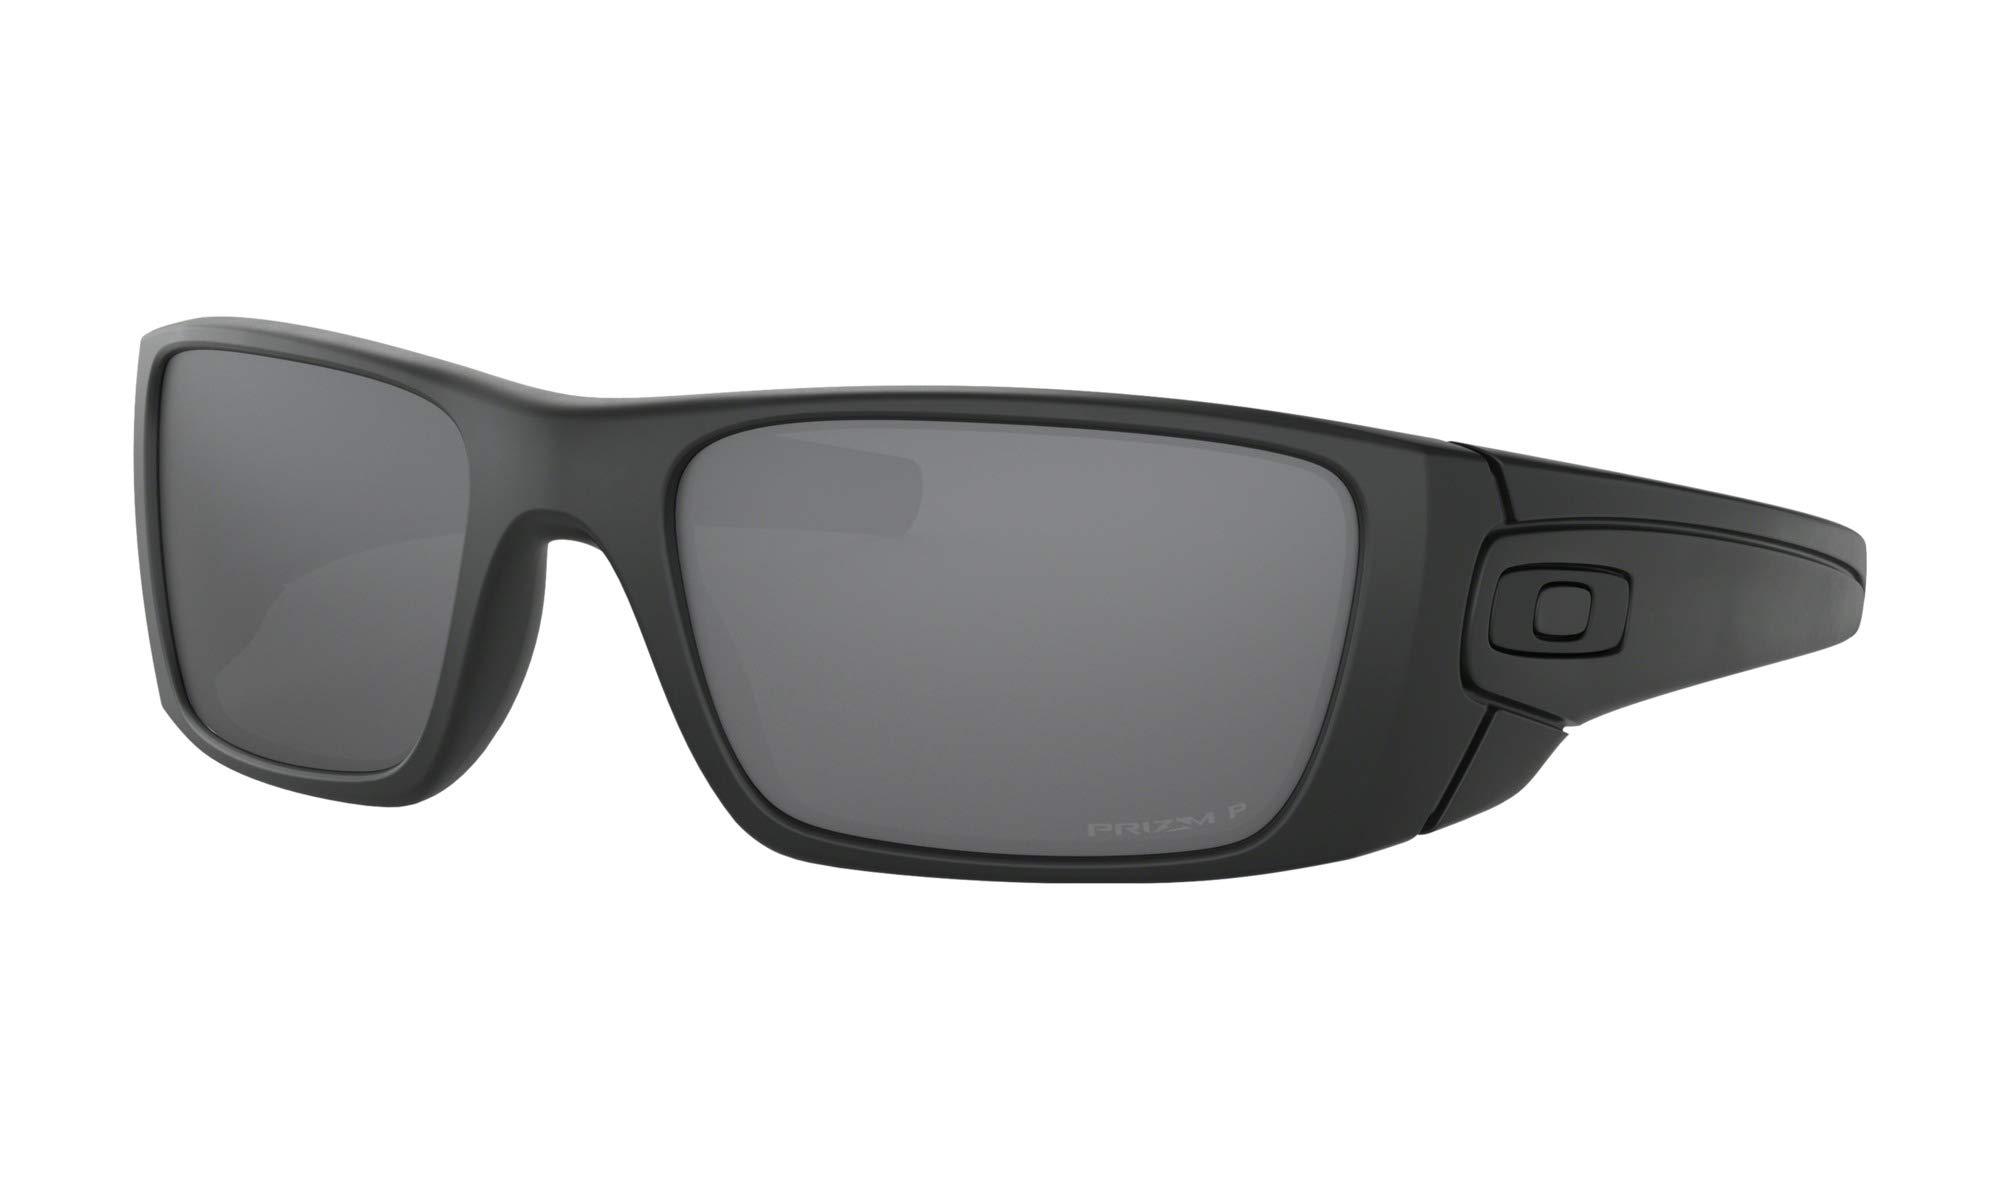 Oakley Men's Standard Issue Fuel Cell Blackside Collection Sunglasses,OS,Matte Black/Prizm Black Polarized by Oakley